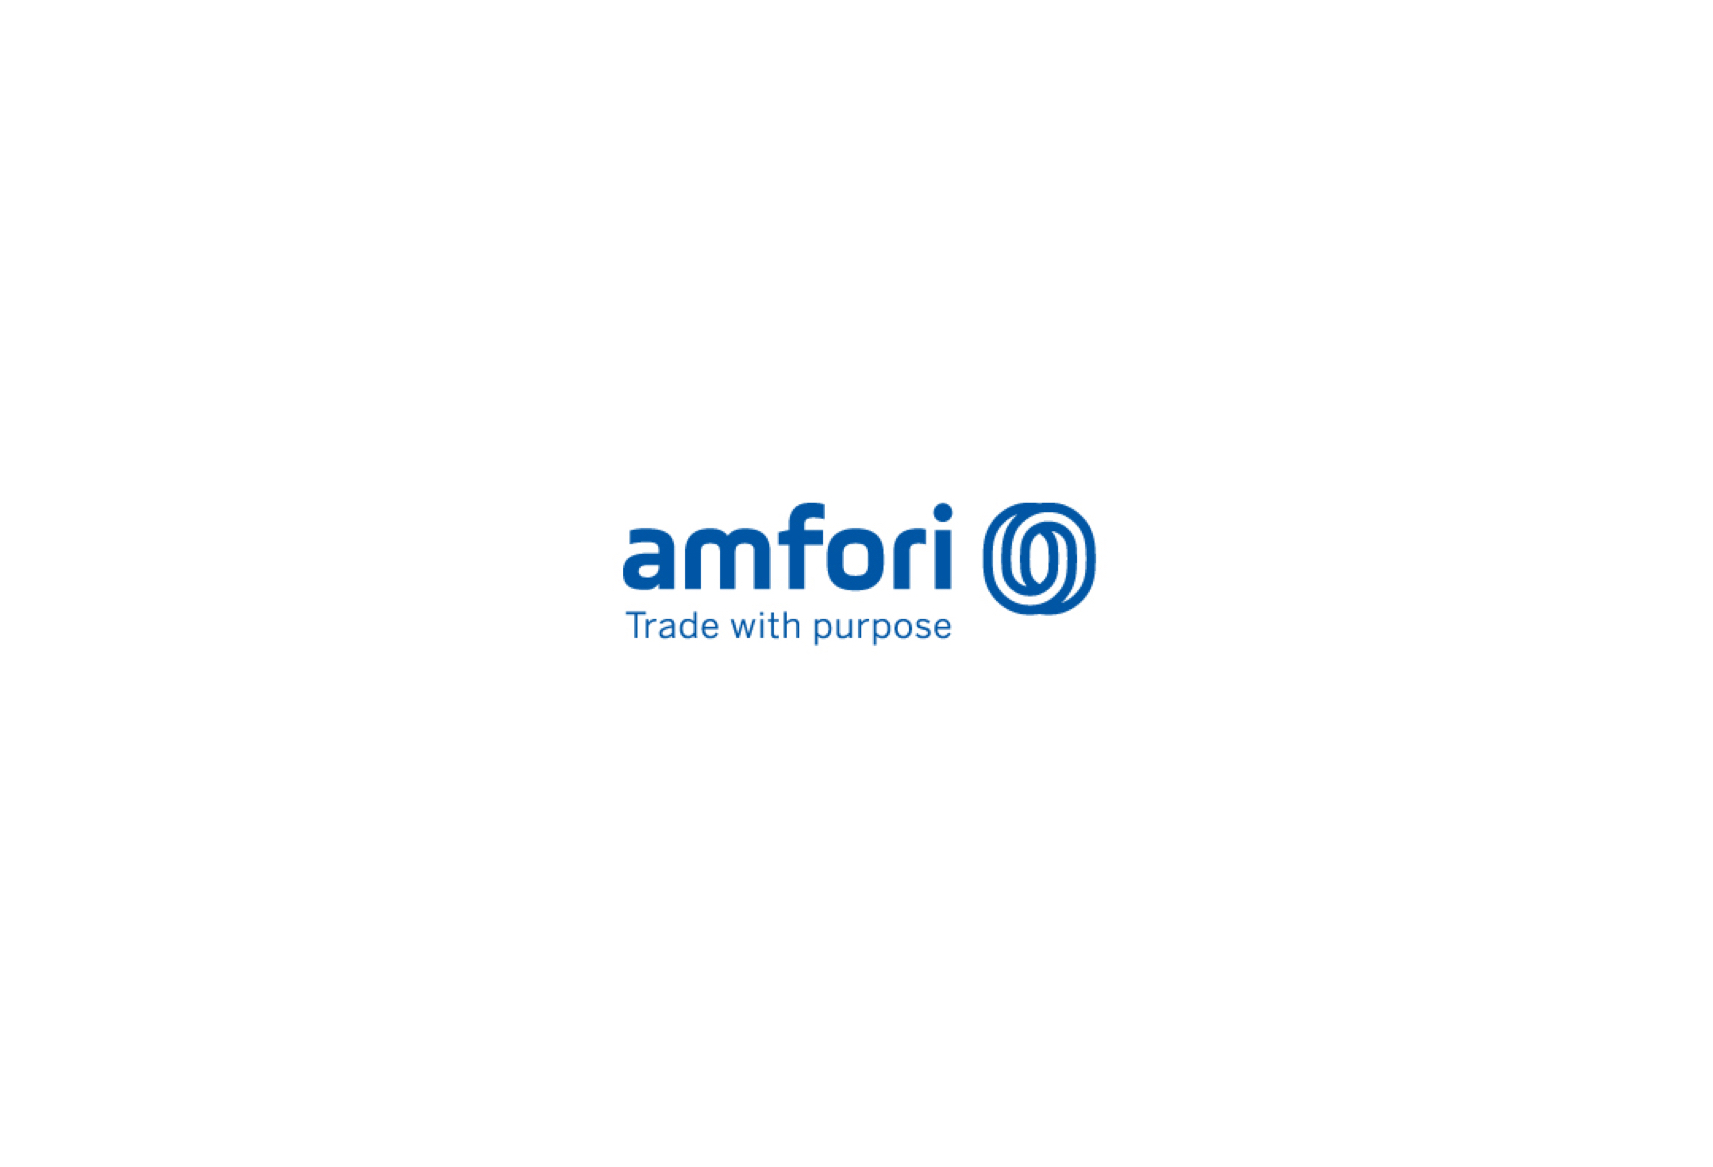 amfori trade with purpose Logo